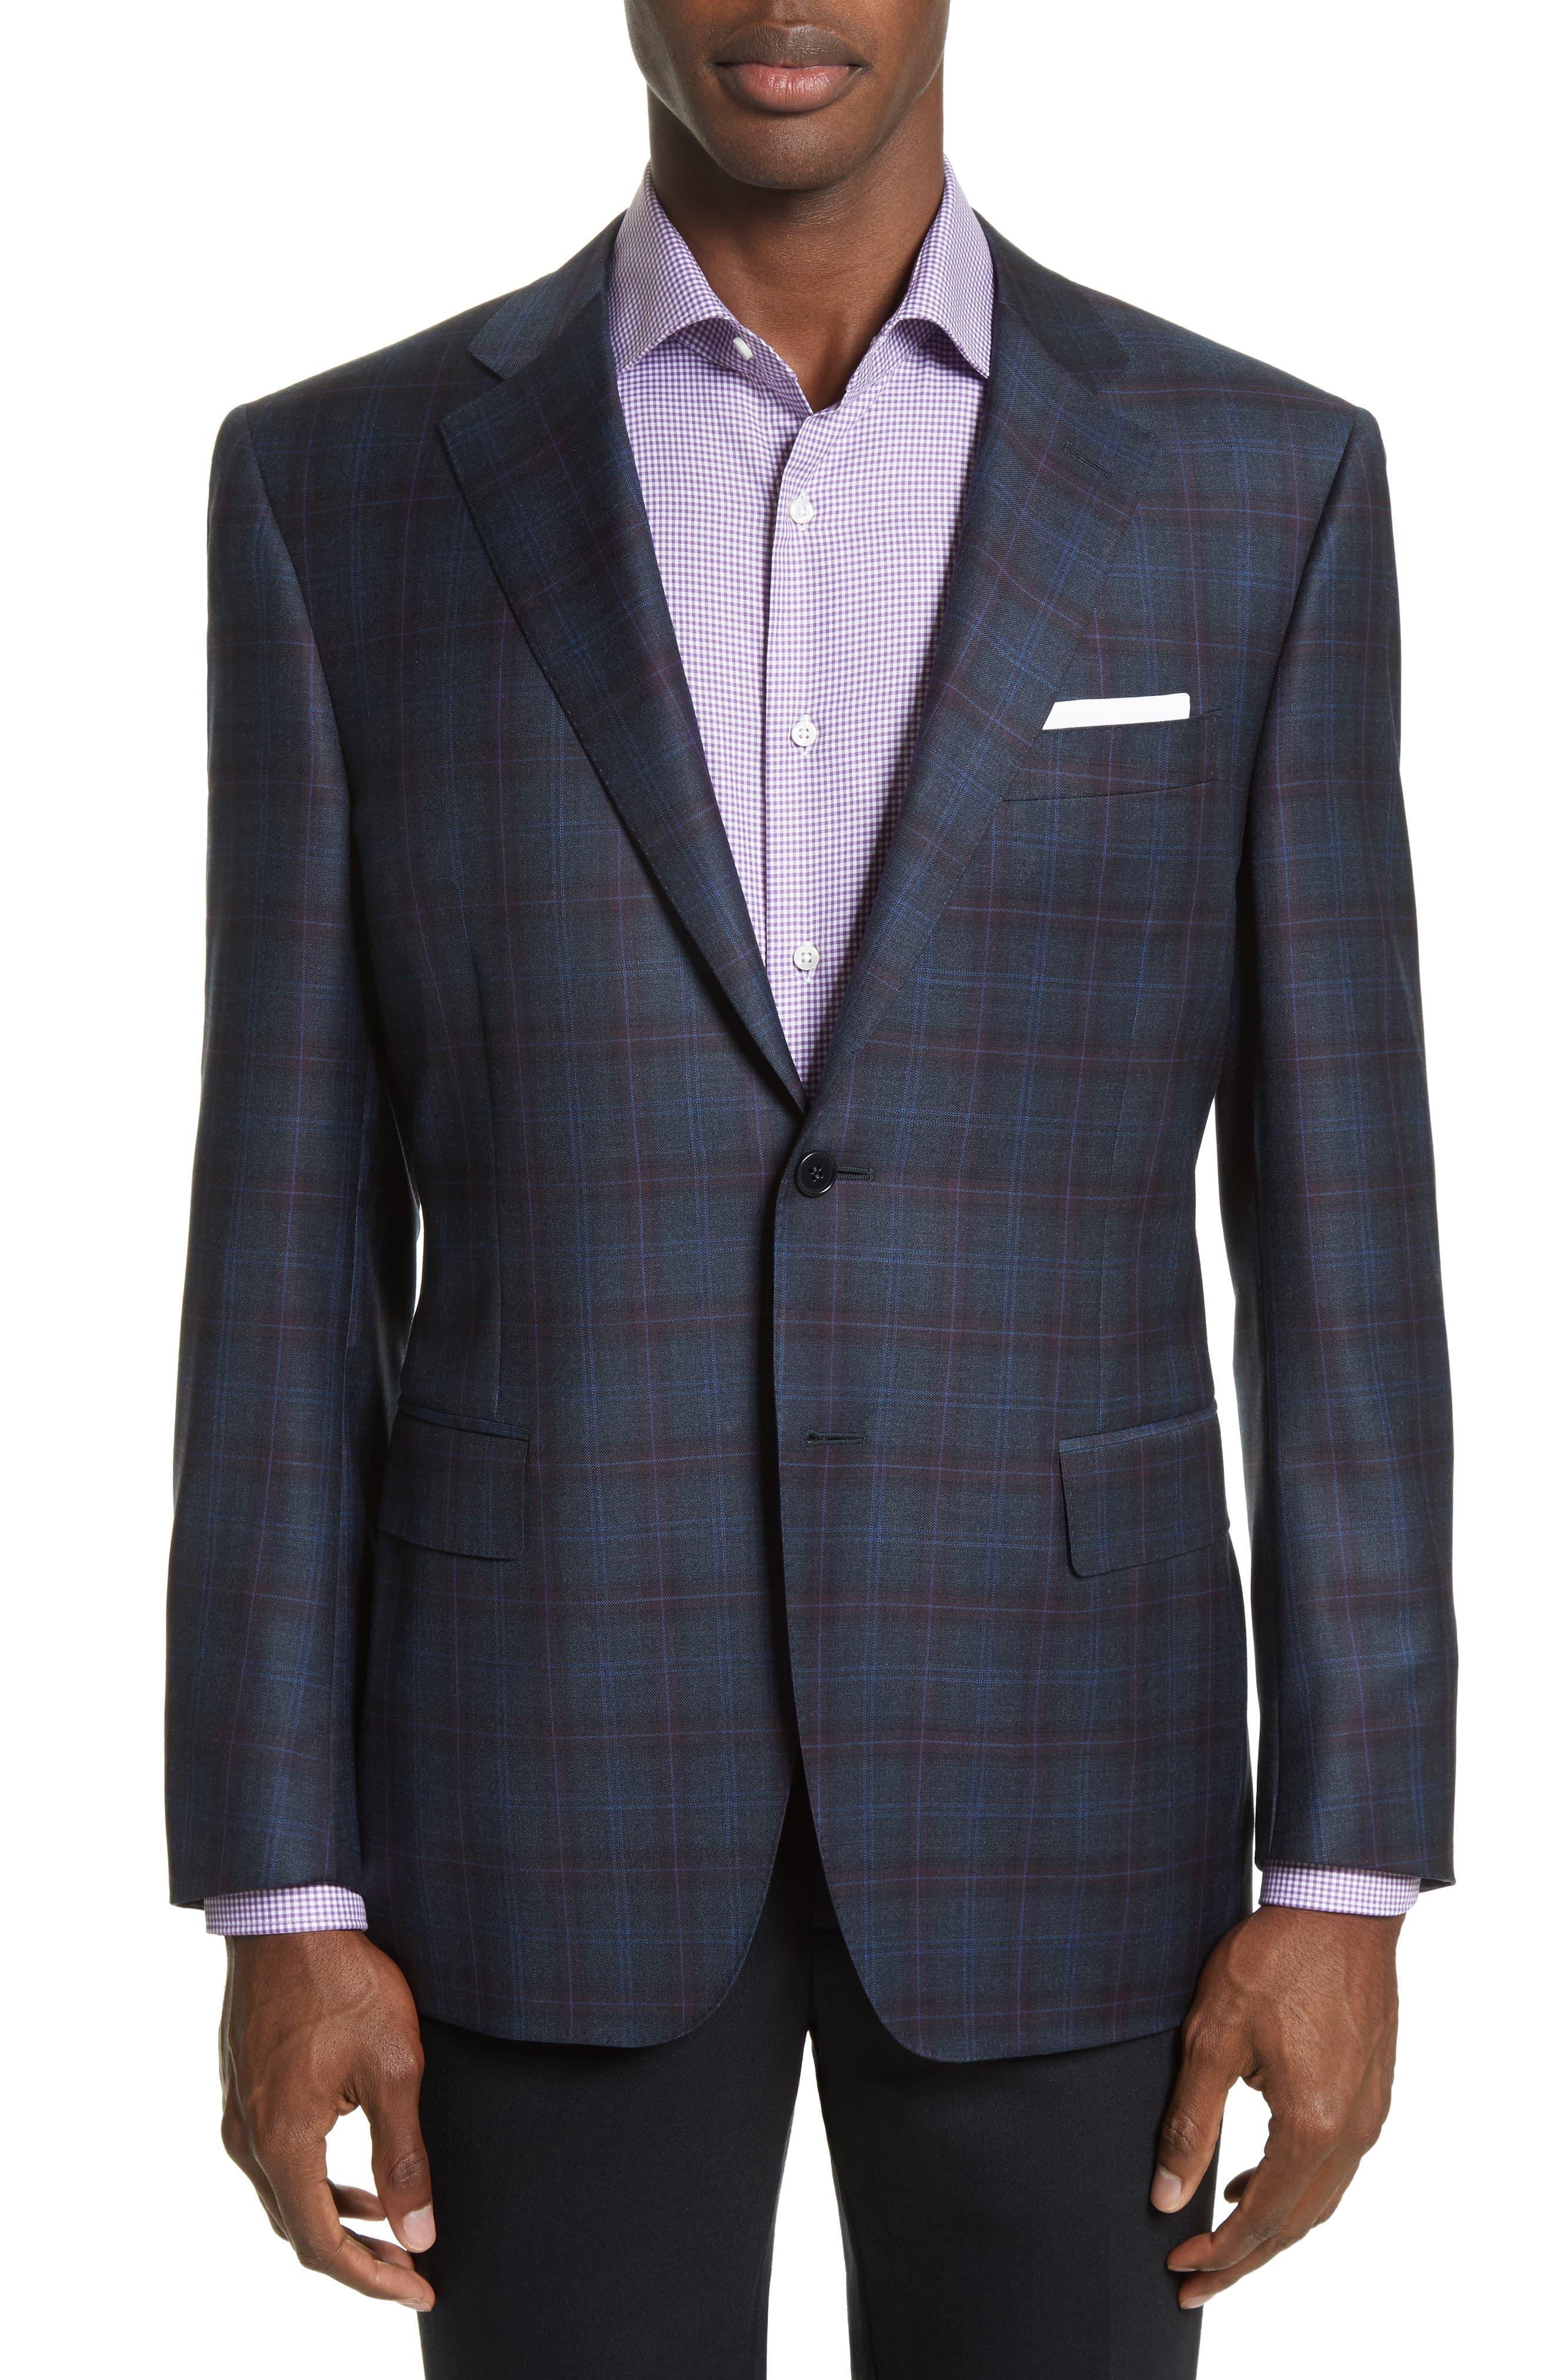 Canali Kei Classic Fit Plaid Wool Sport Coat (Regular & Big)